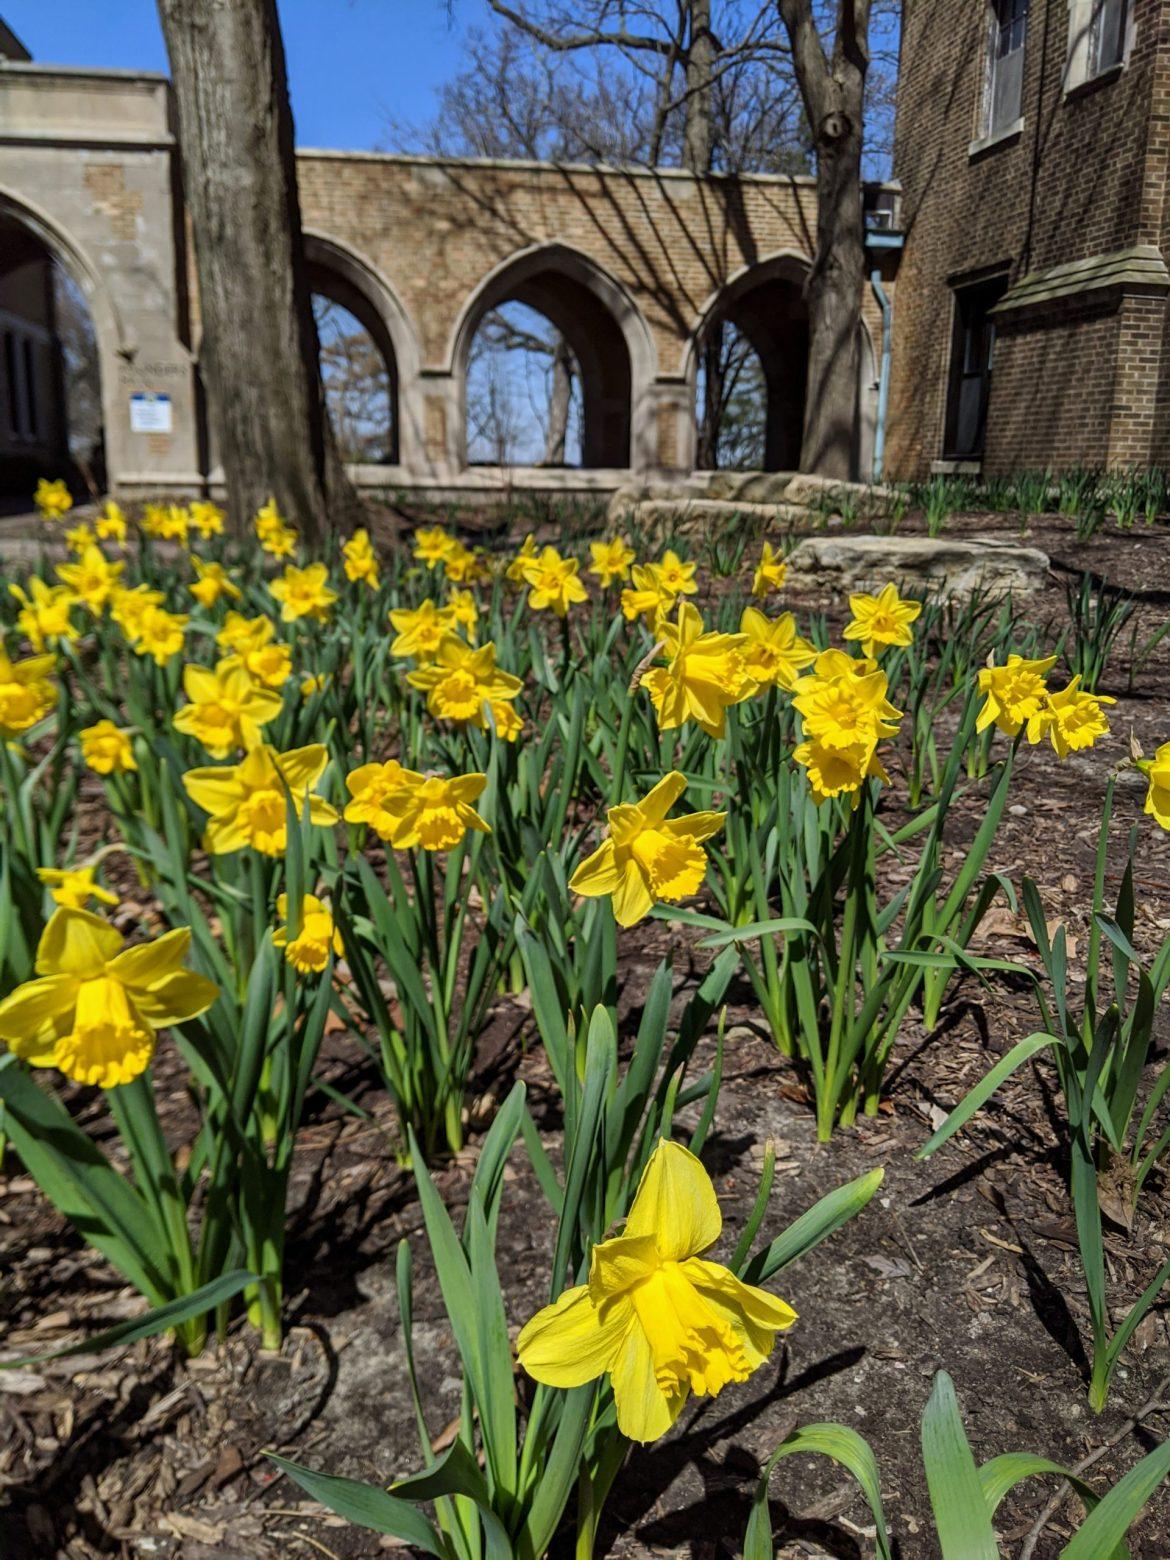 Daffodils at Augustana